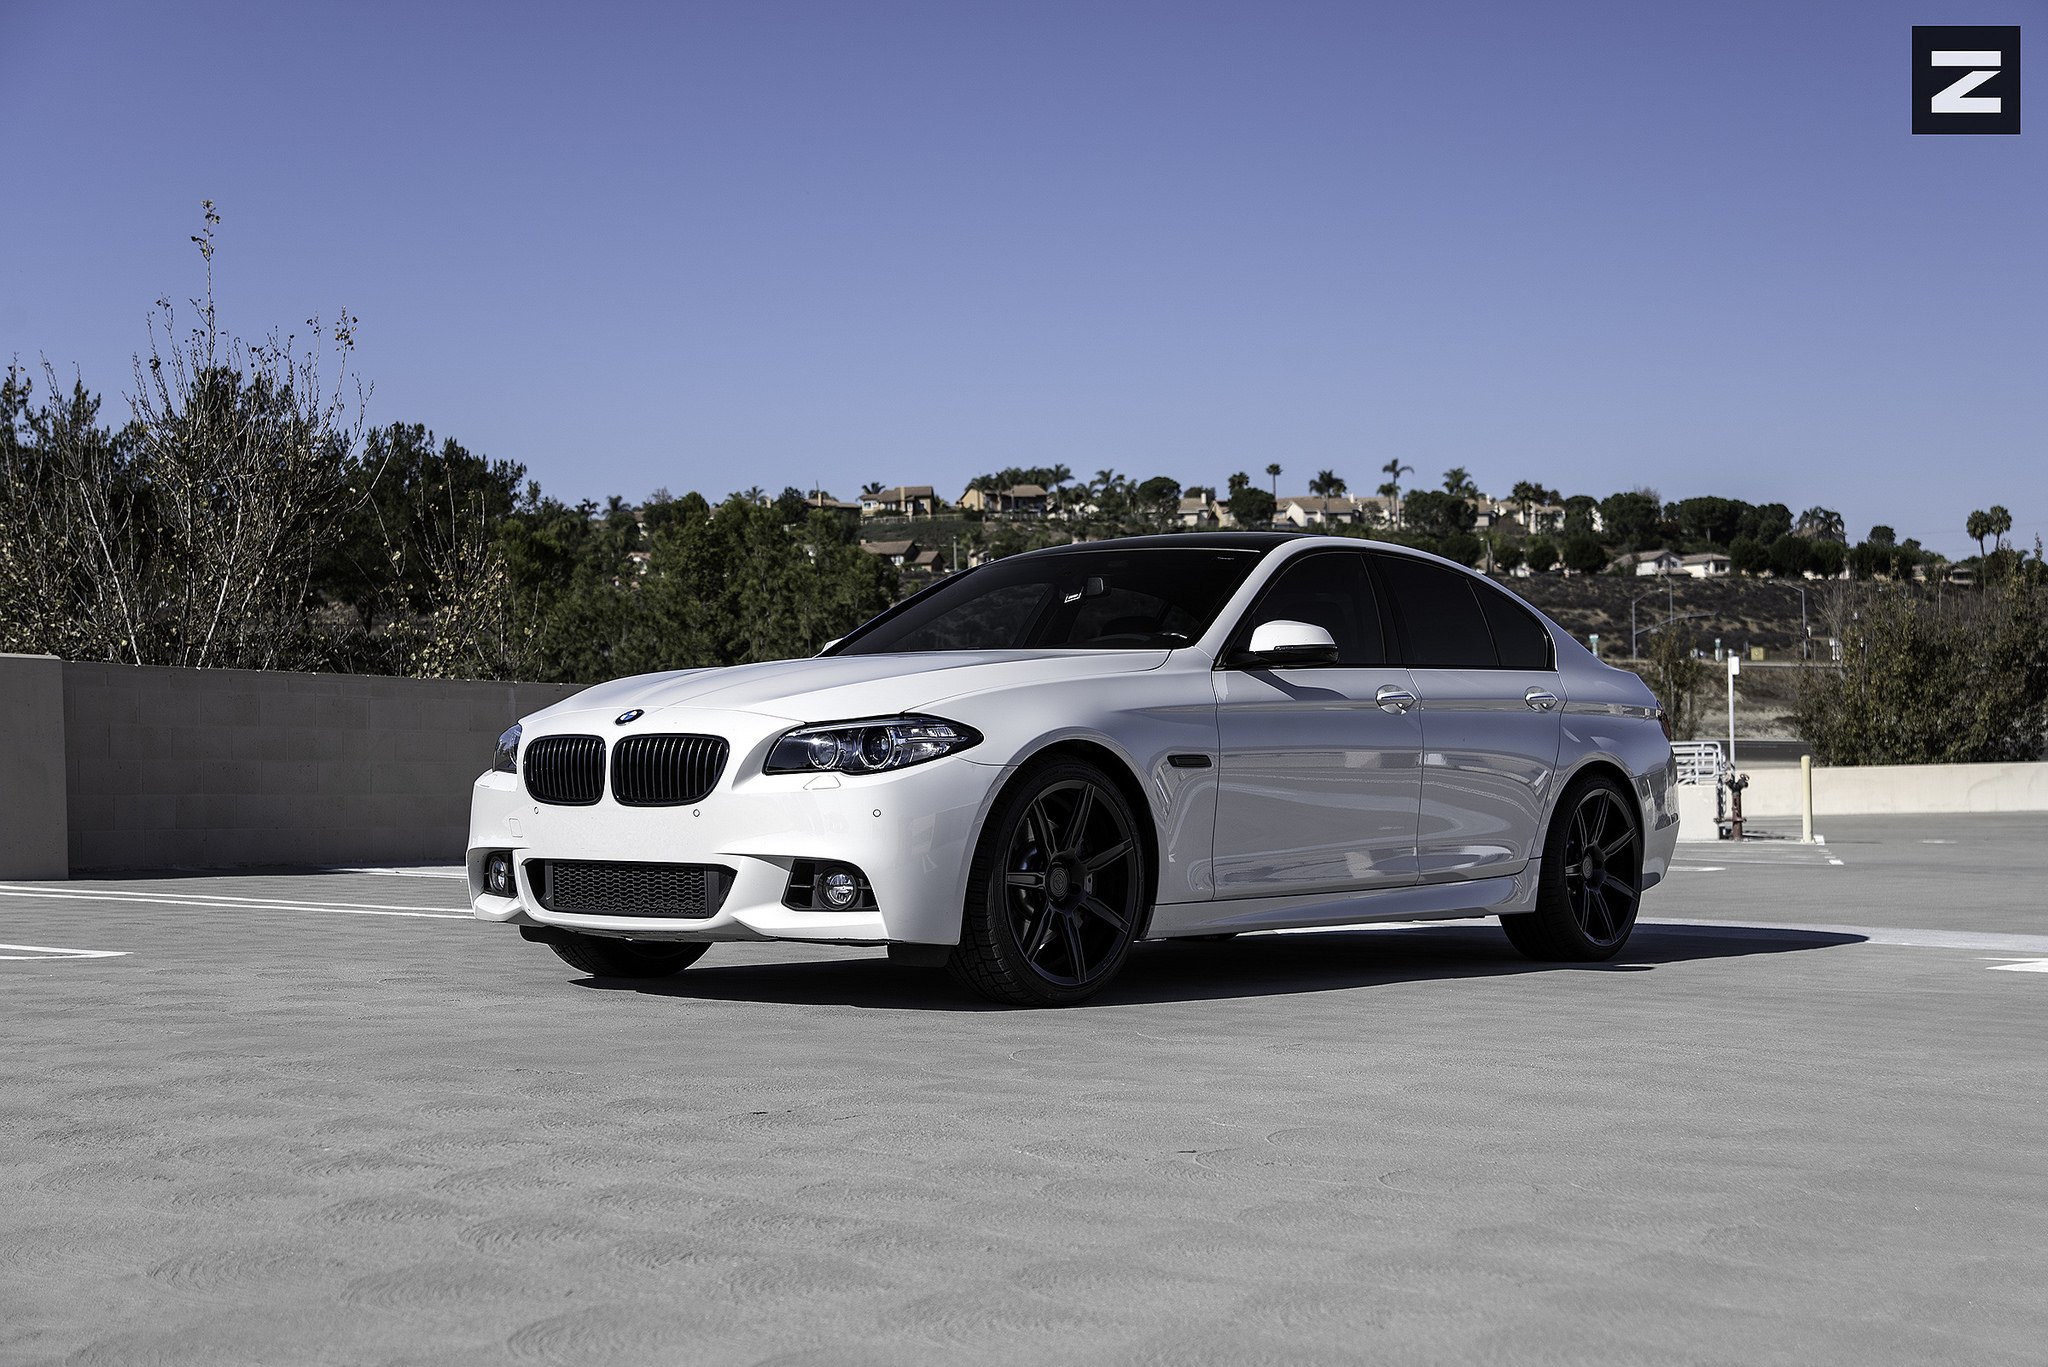 Starke Contrast White Bmw 5 Series On Black Custom Rims